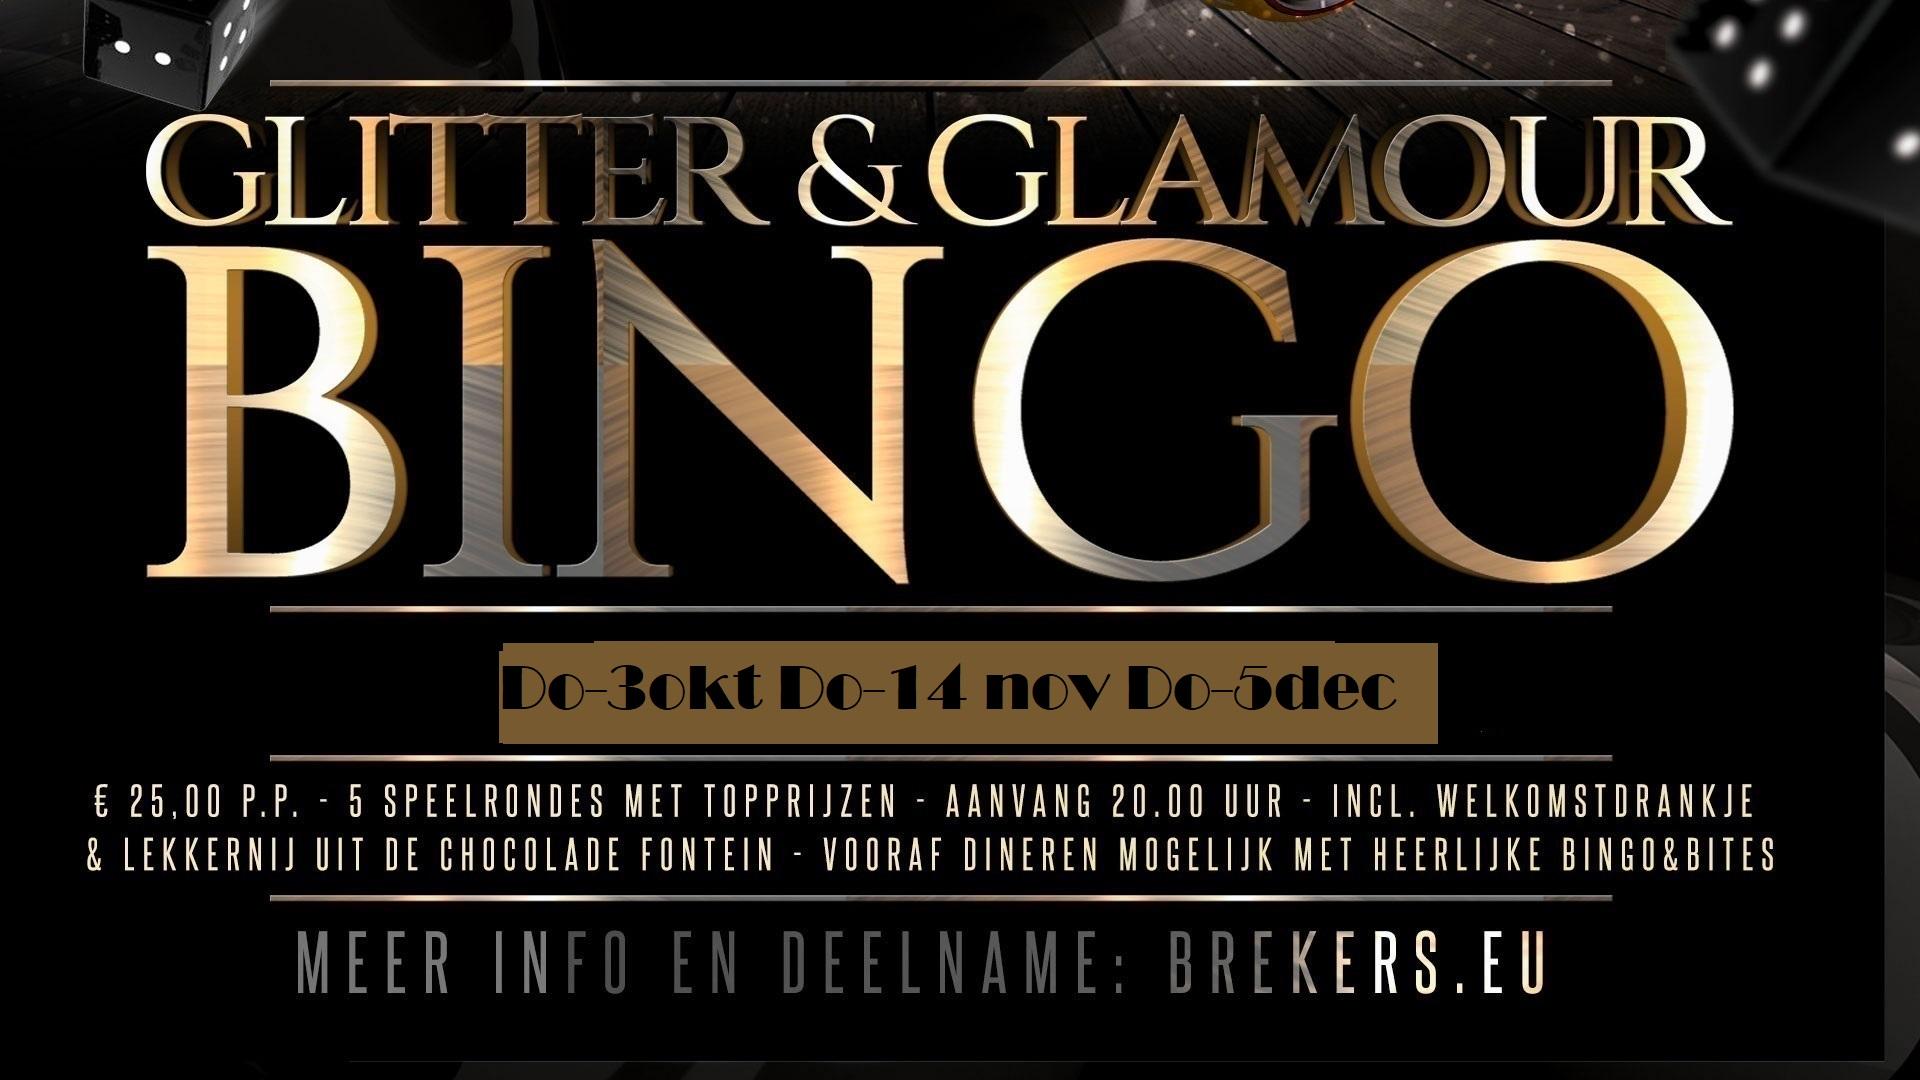 Glitter & Glamour Bingo 3 oktober